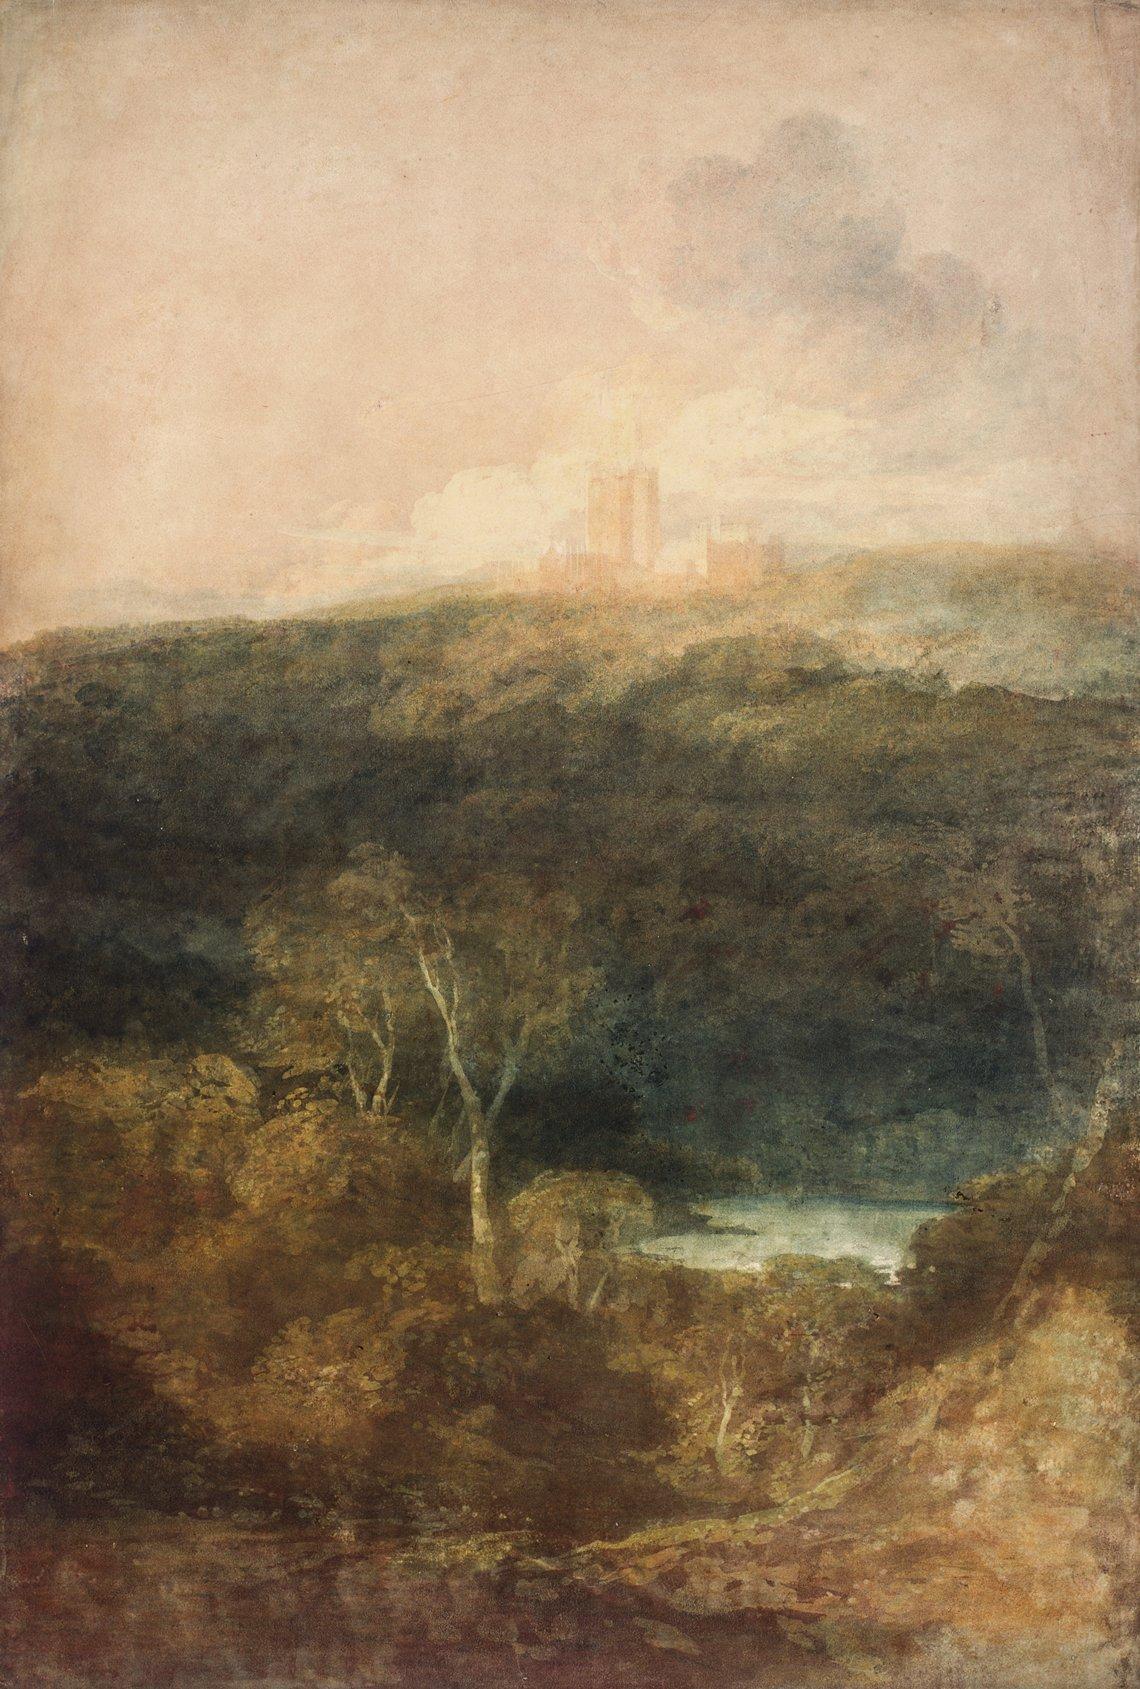 Turner Watercolor Paintings : turner, watercolor, paintings, J.M.W., Turner:, Watercolors, Nicholas, Incollect